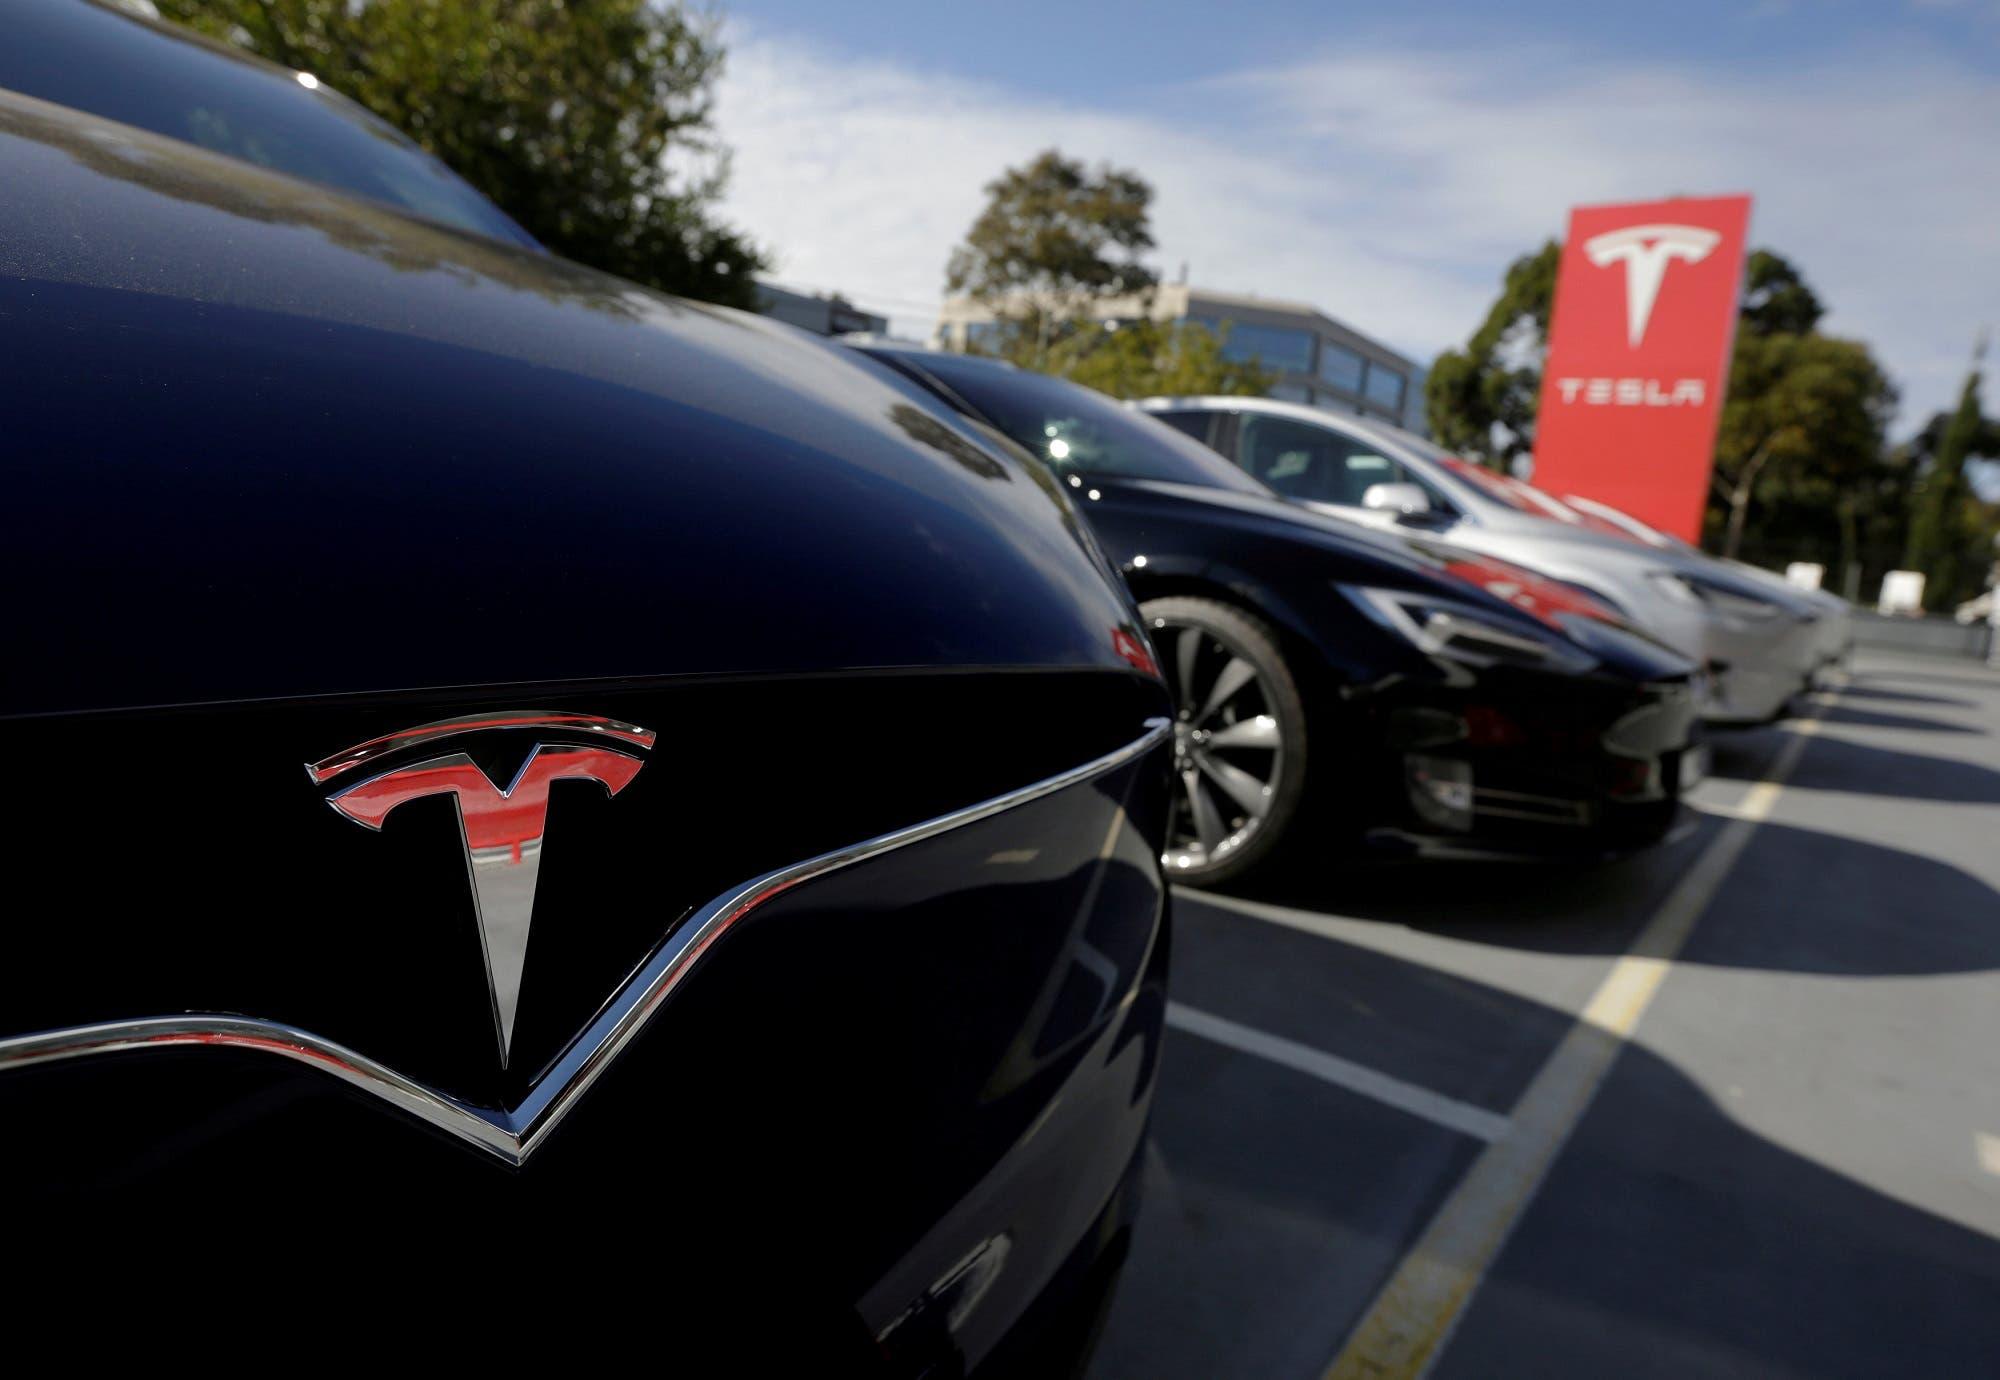 A Tesla Model X is photographed alongside a Model S at a Tesla electric car dealership in Sydney, Australia, May 31, 2017. (Reuters)